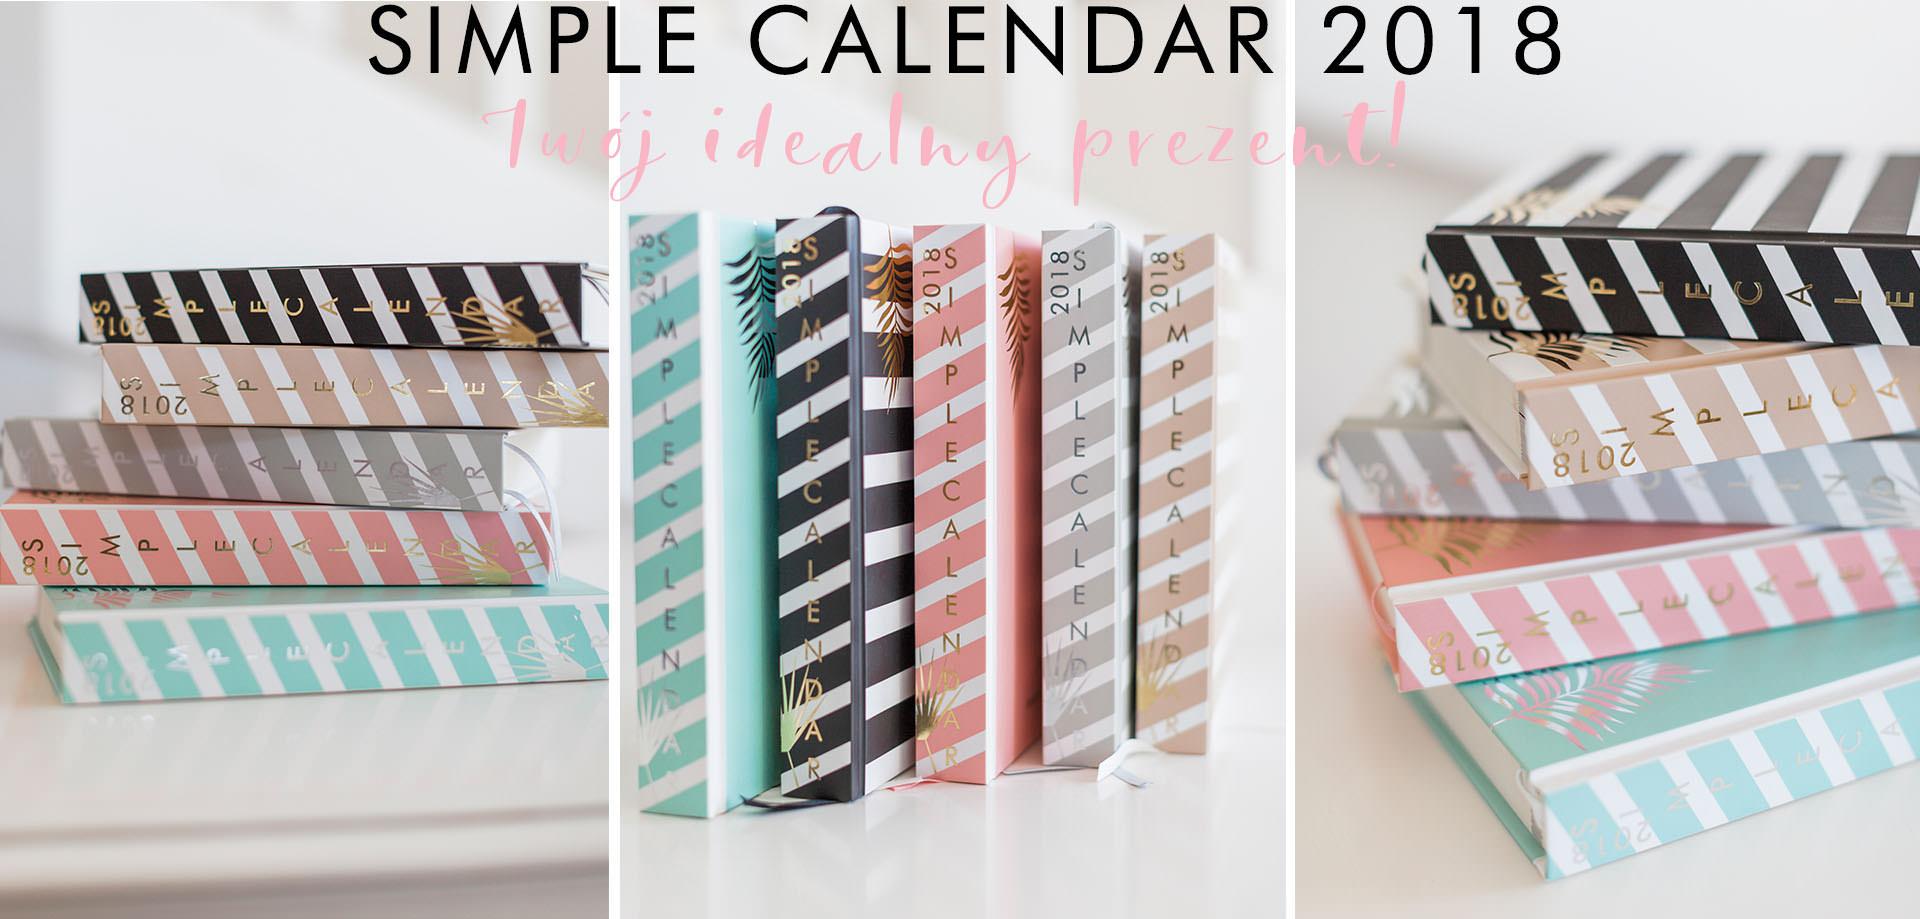 simple-calendar-2018-kalendarz-planer-prezent-dla-kobiety-05a